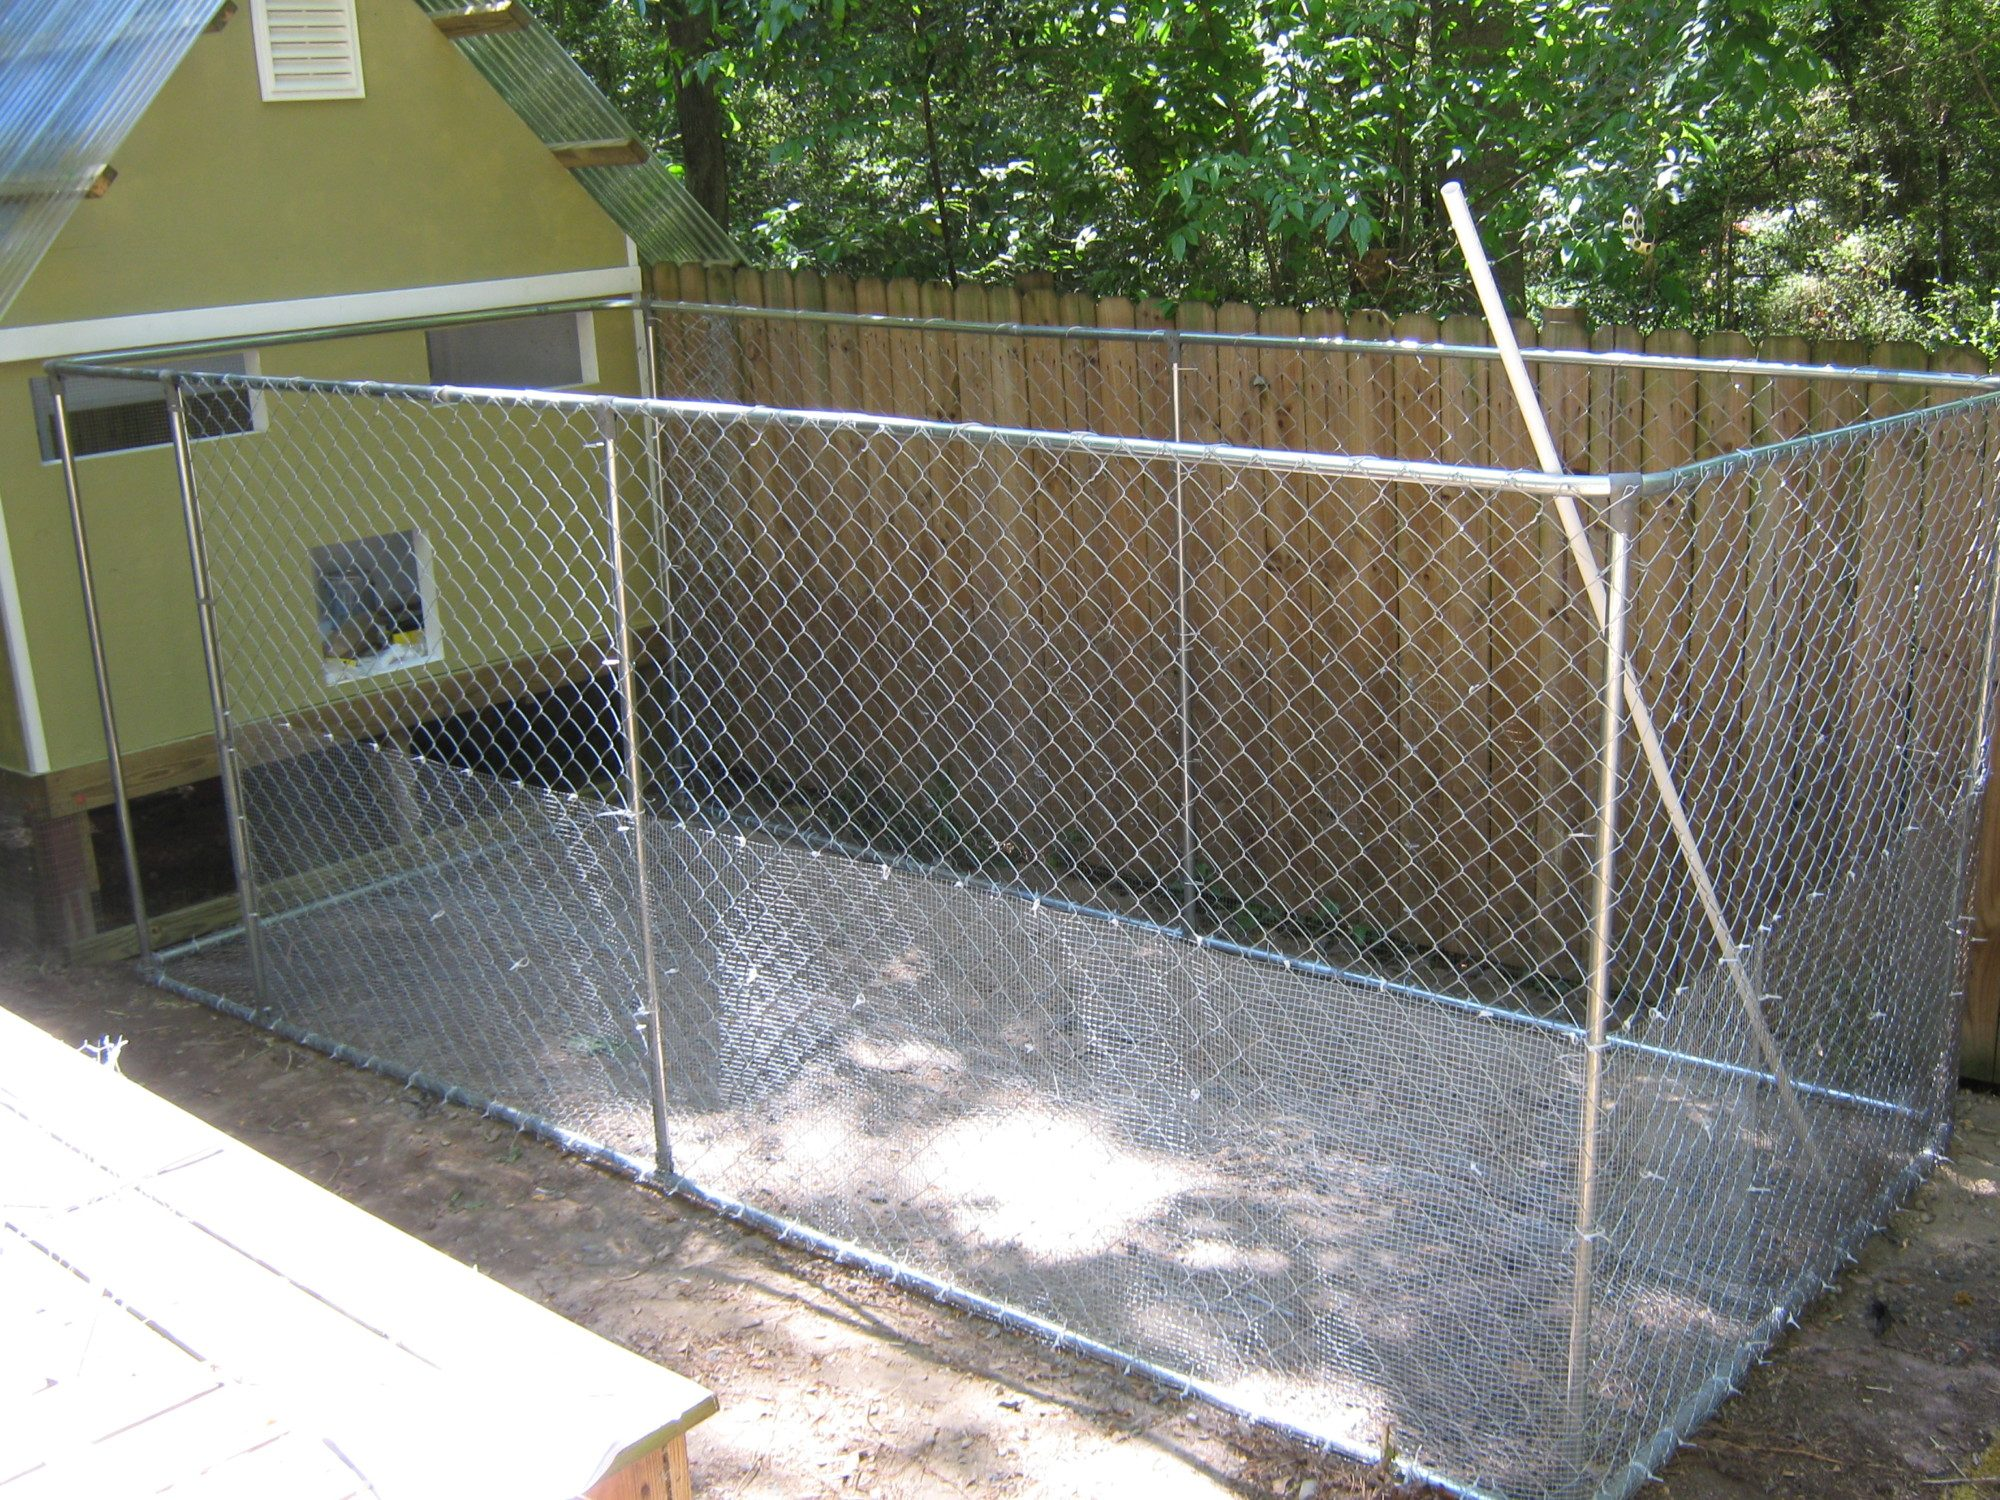 Hardware Cloth vs. Rabbit Cage Fencing | BackYard Chickens